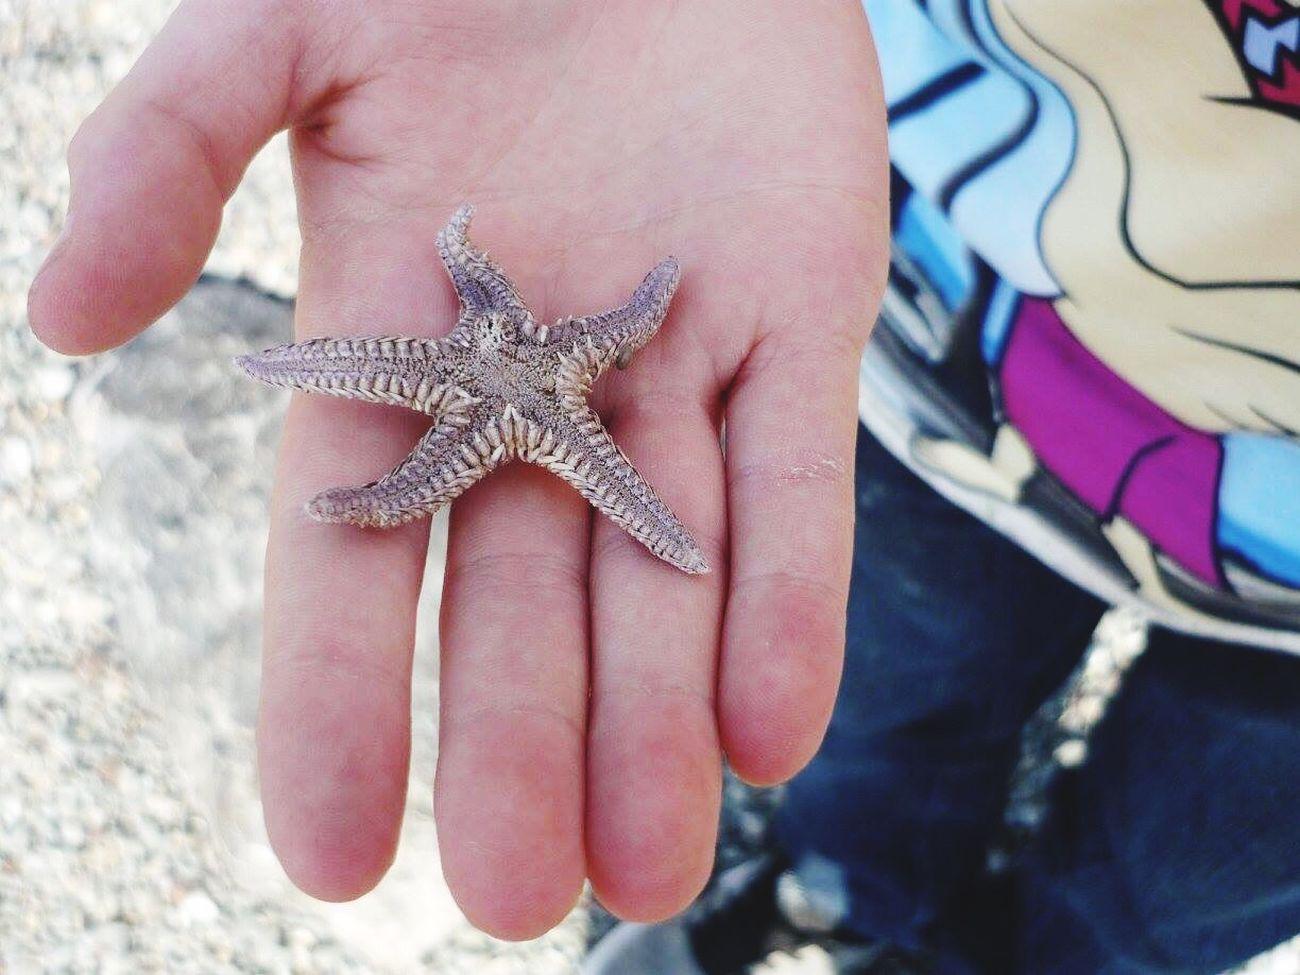 Holding One Animal Kalamata Beautiful Nature Starfish At Beach